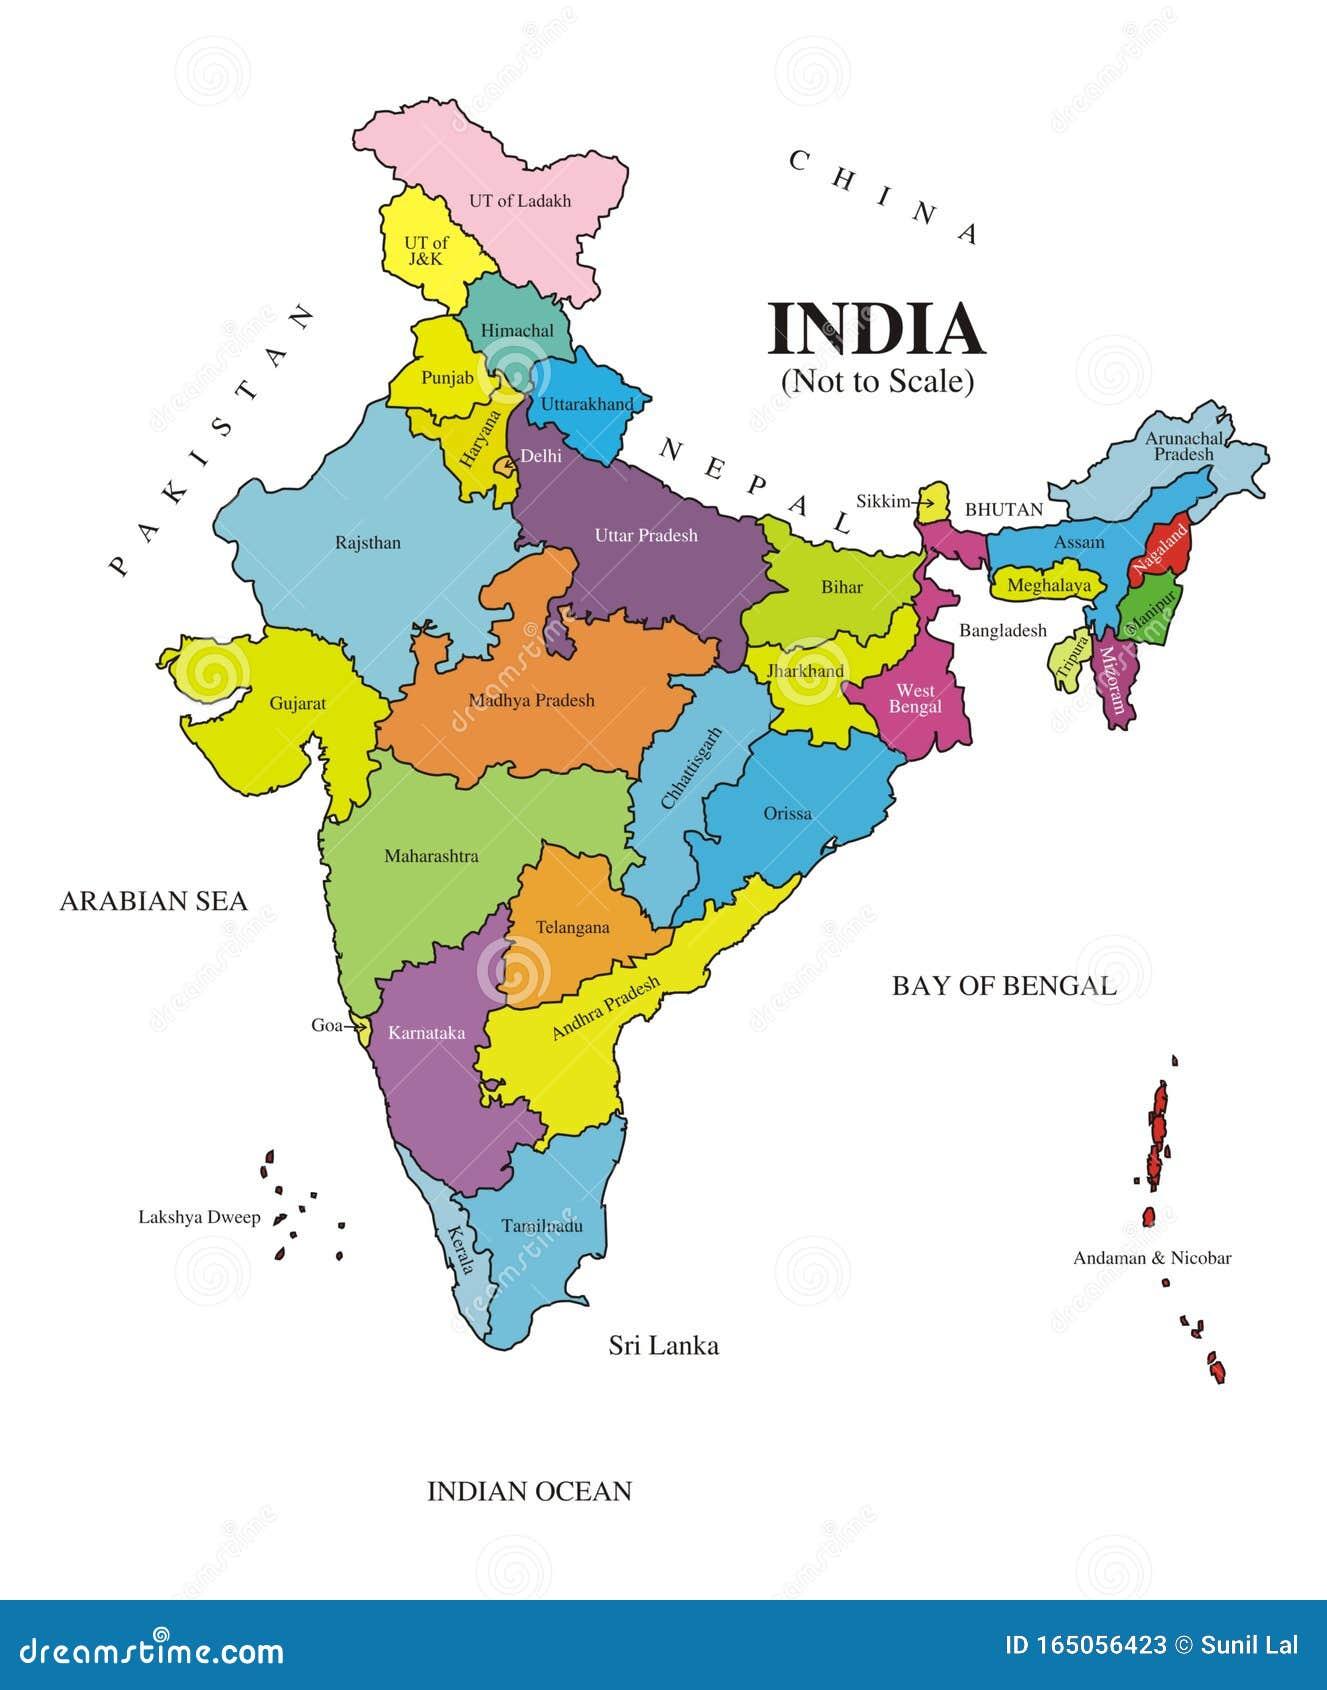 Picture of: India Bangladesh Pakistan Map Stock Illustrations 144 India Bangladesh Pakistan Map Stock Illustrations Vectors Clipart Dreamstime